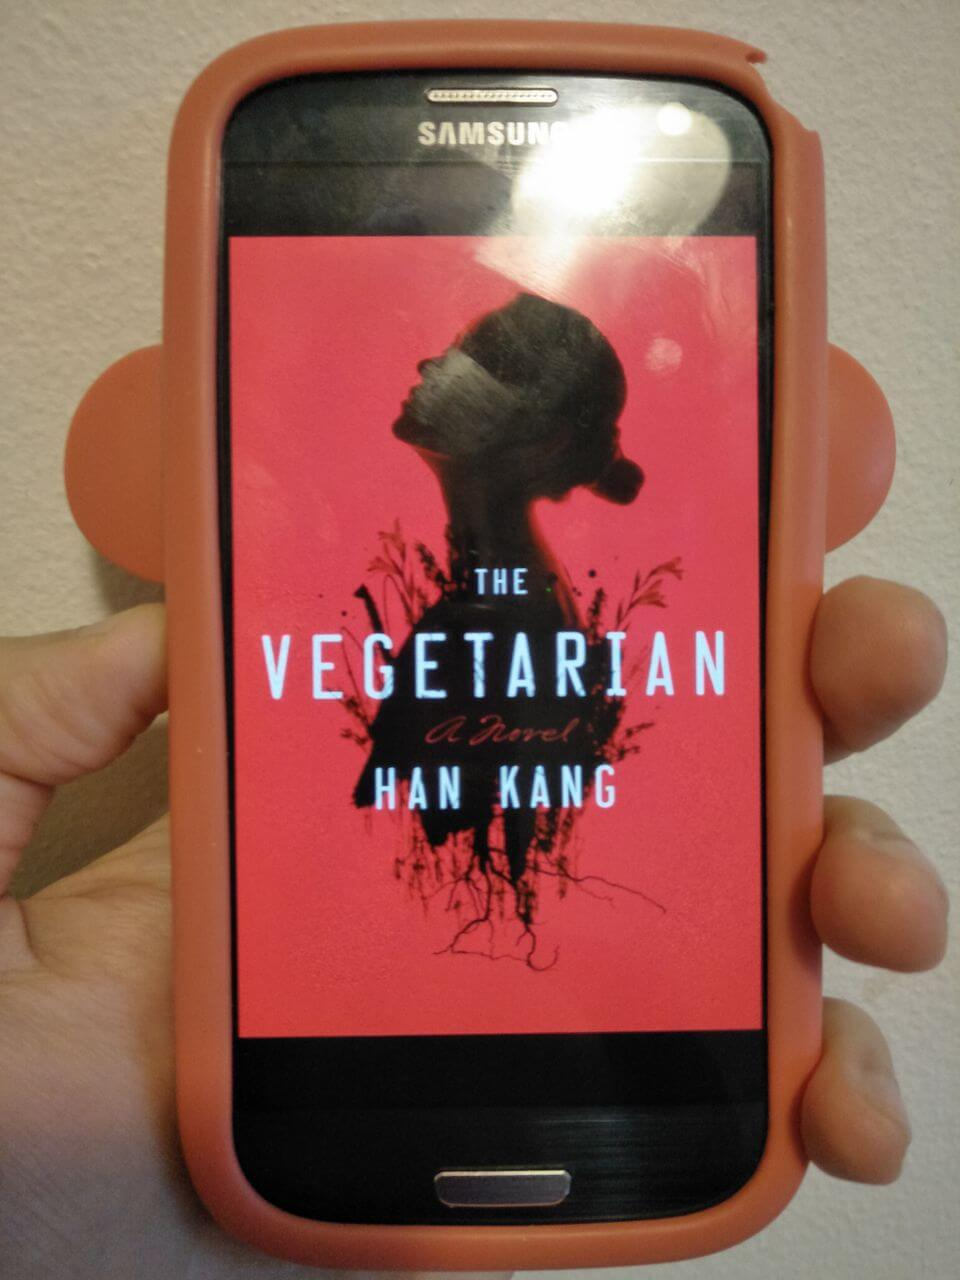 The Vegetarian by Han Kang (translated by Deborah Smith